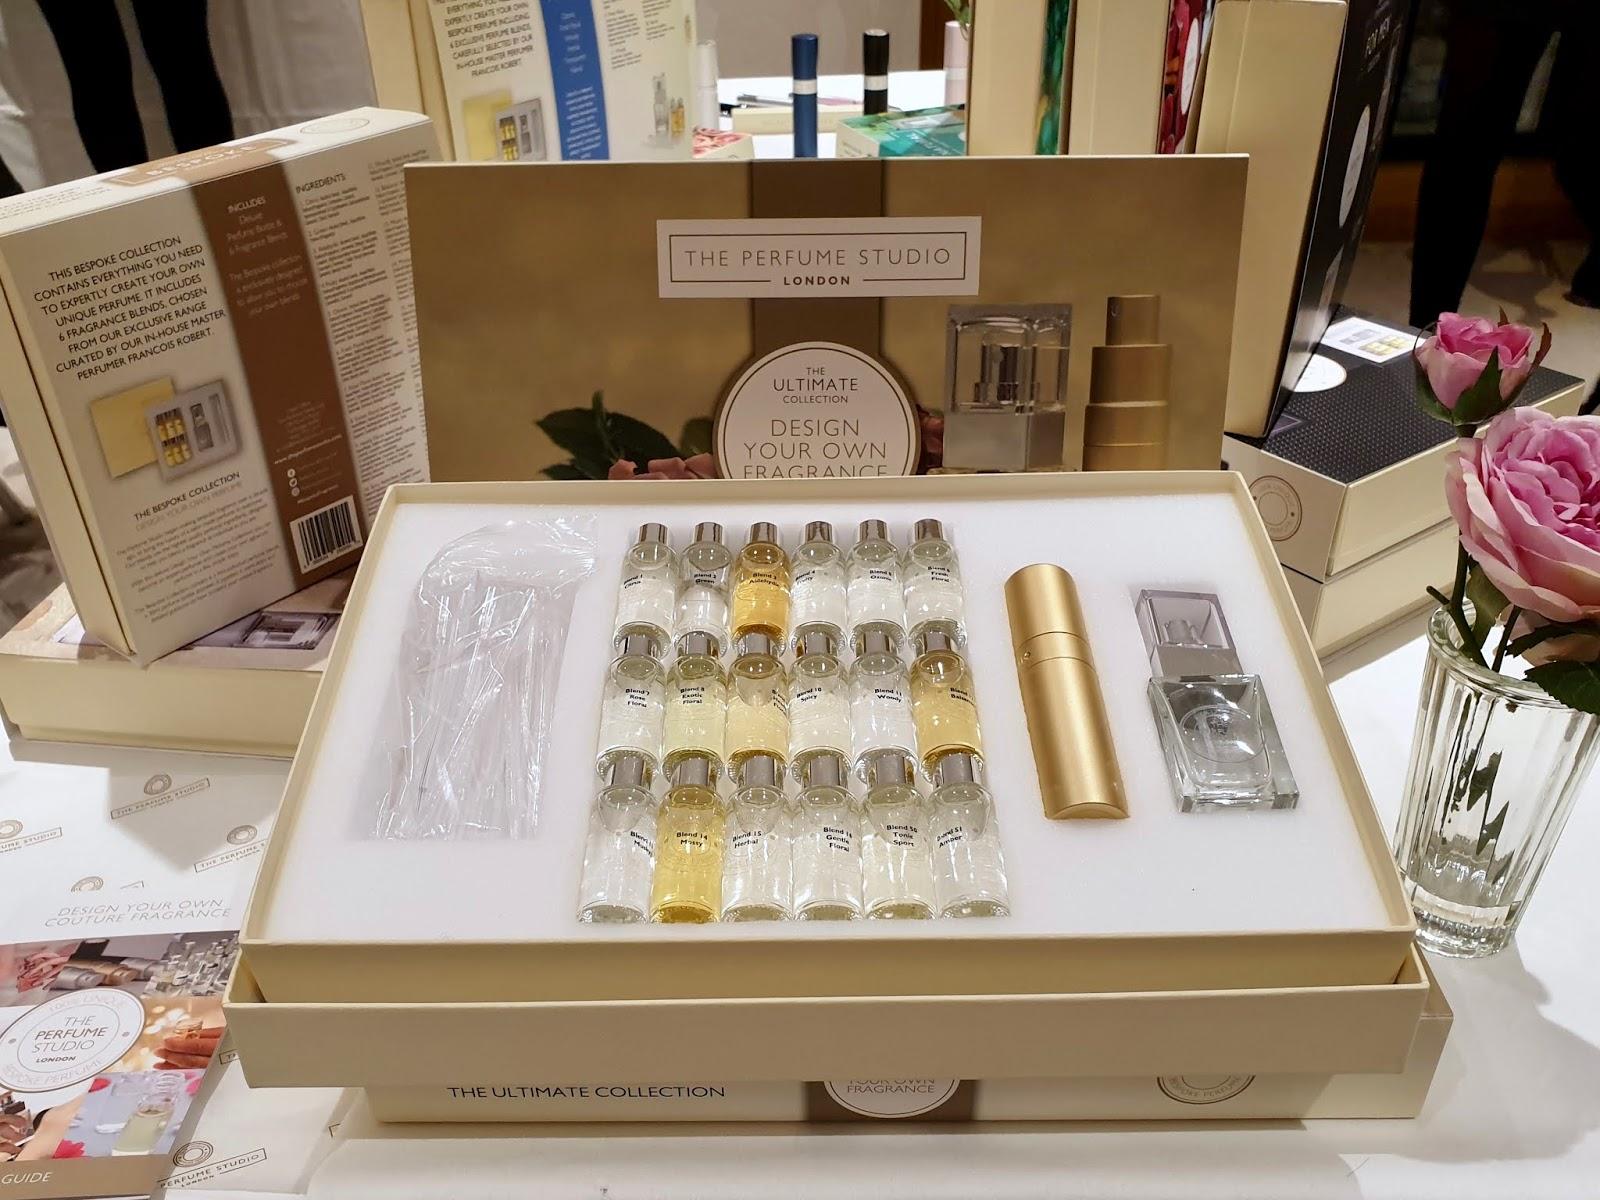 the perfume studio gift set